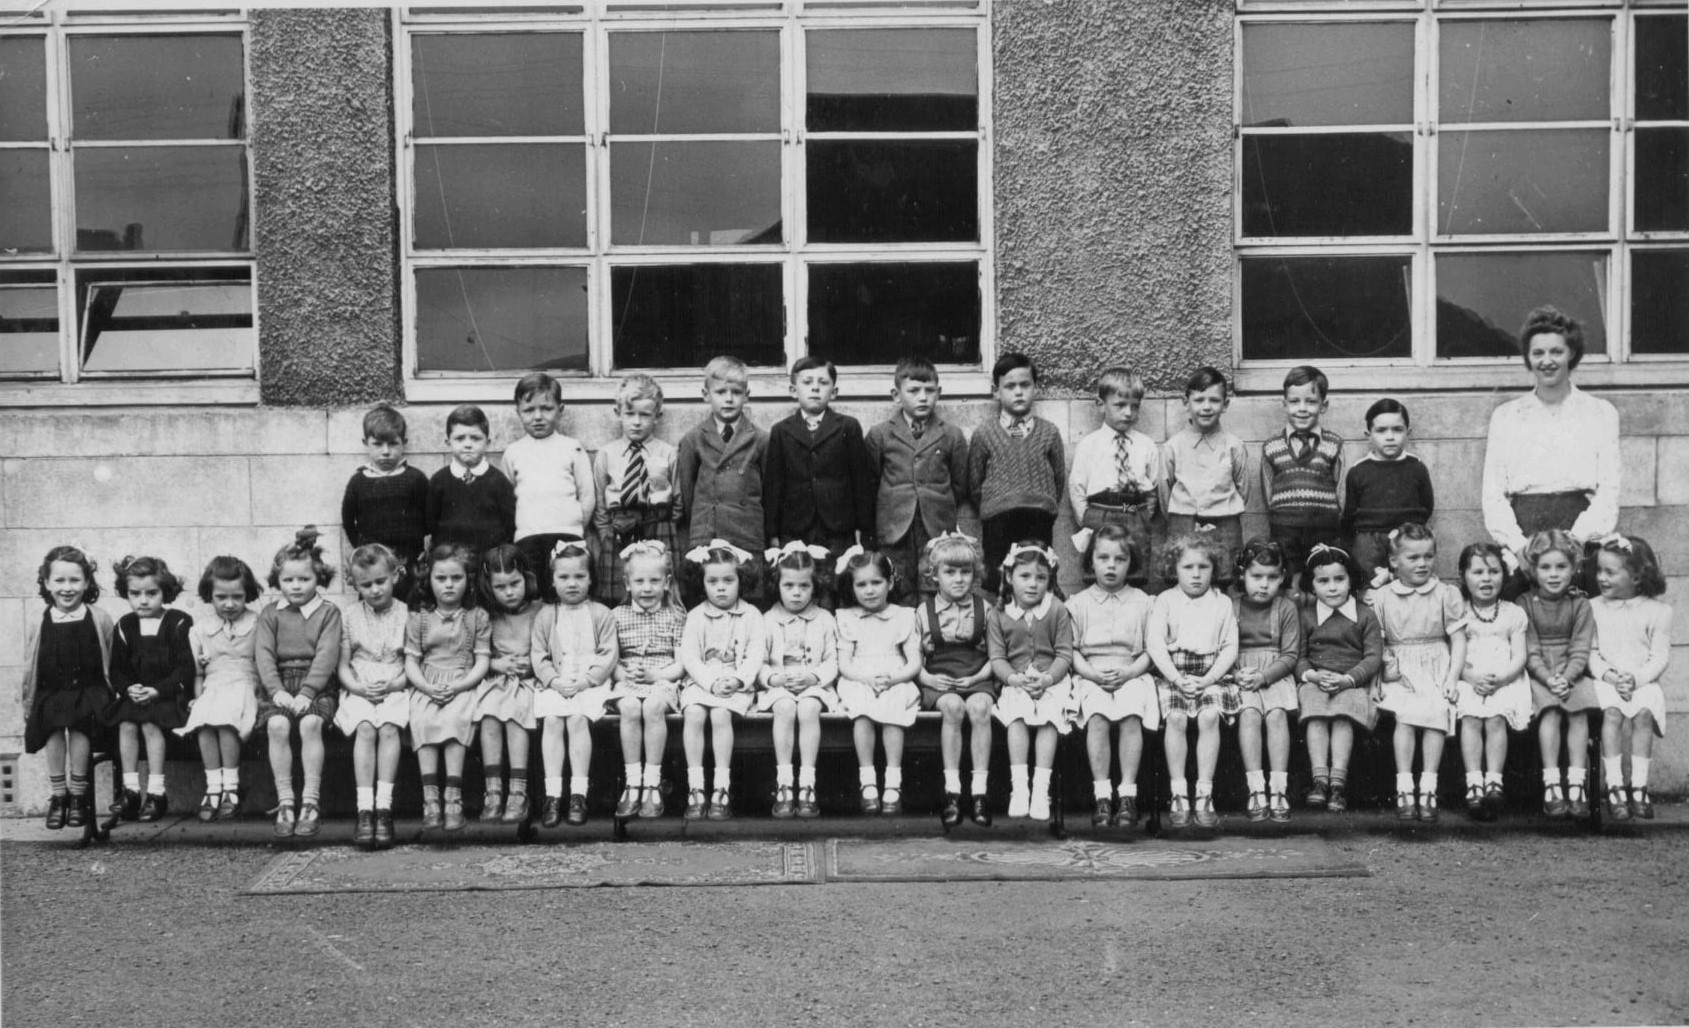 Murrayburn Primary School - Miss Jenkins Class of 1948